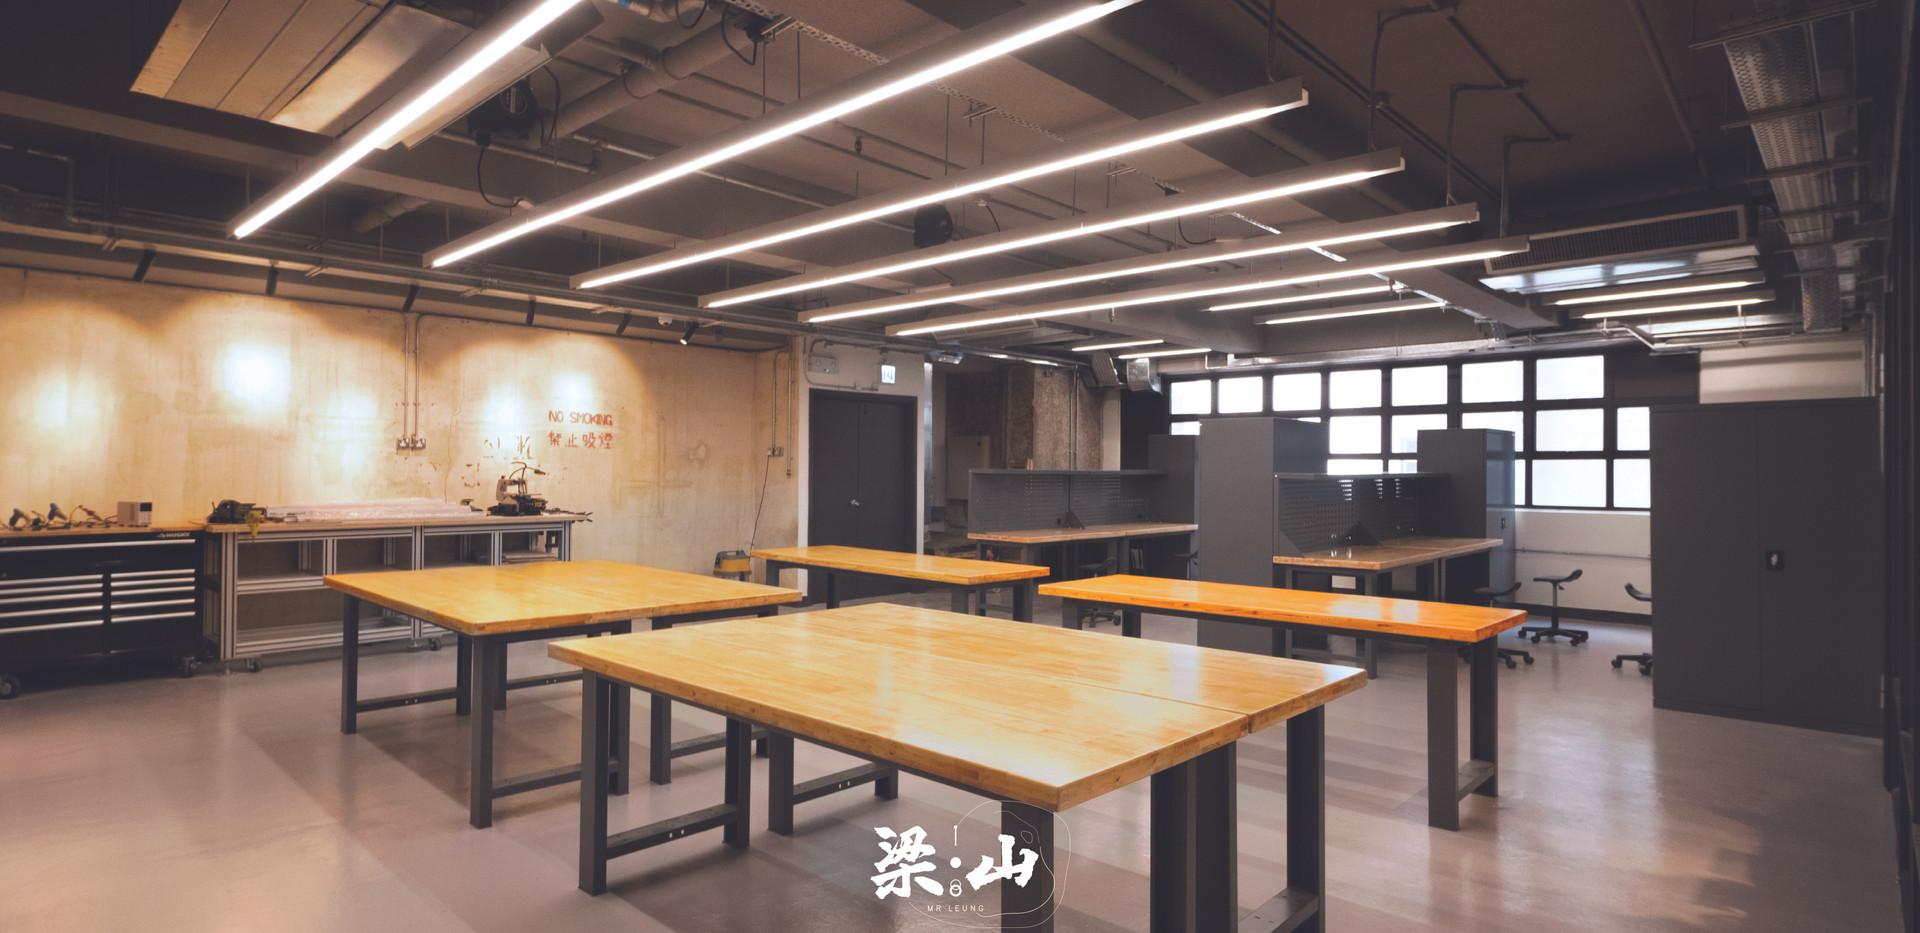 Maker corner 梁山製造角 | 工場與工作枱